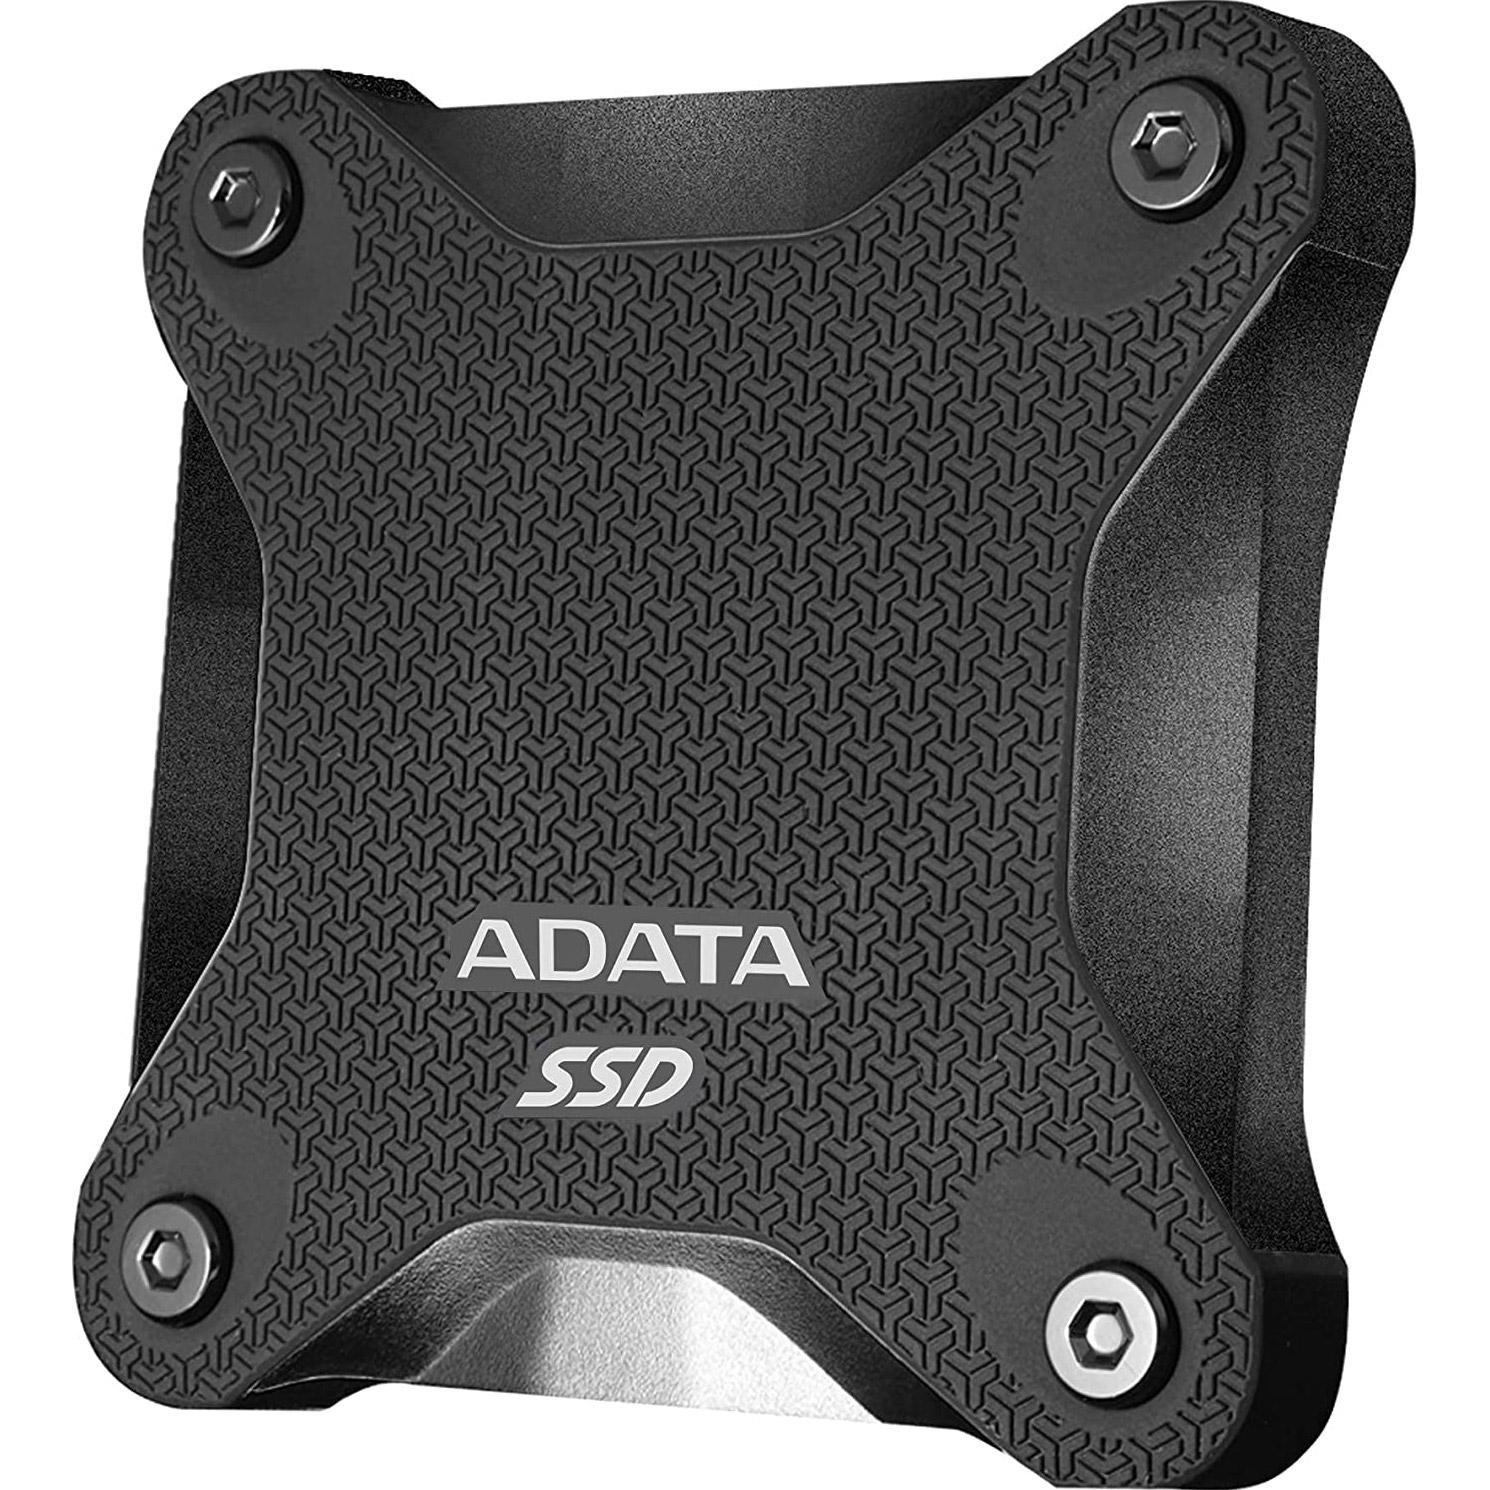 Портативный SSD ADATA SD600Q 480GB Black (ASD600Q-480GU31-CBK)